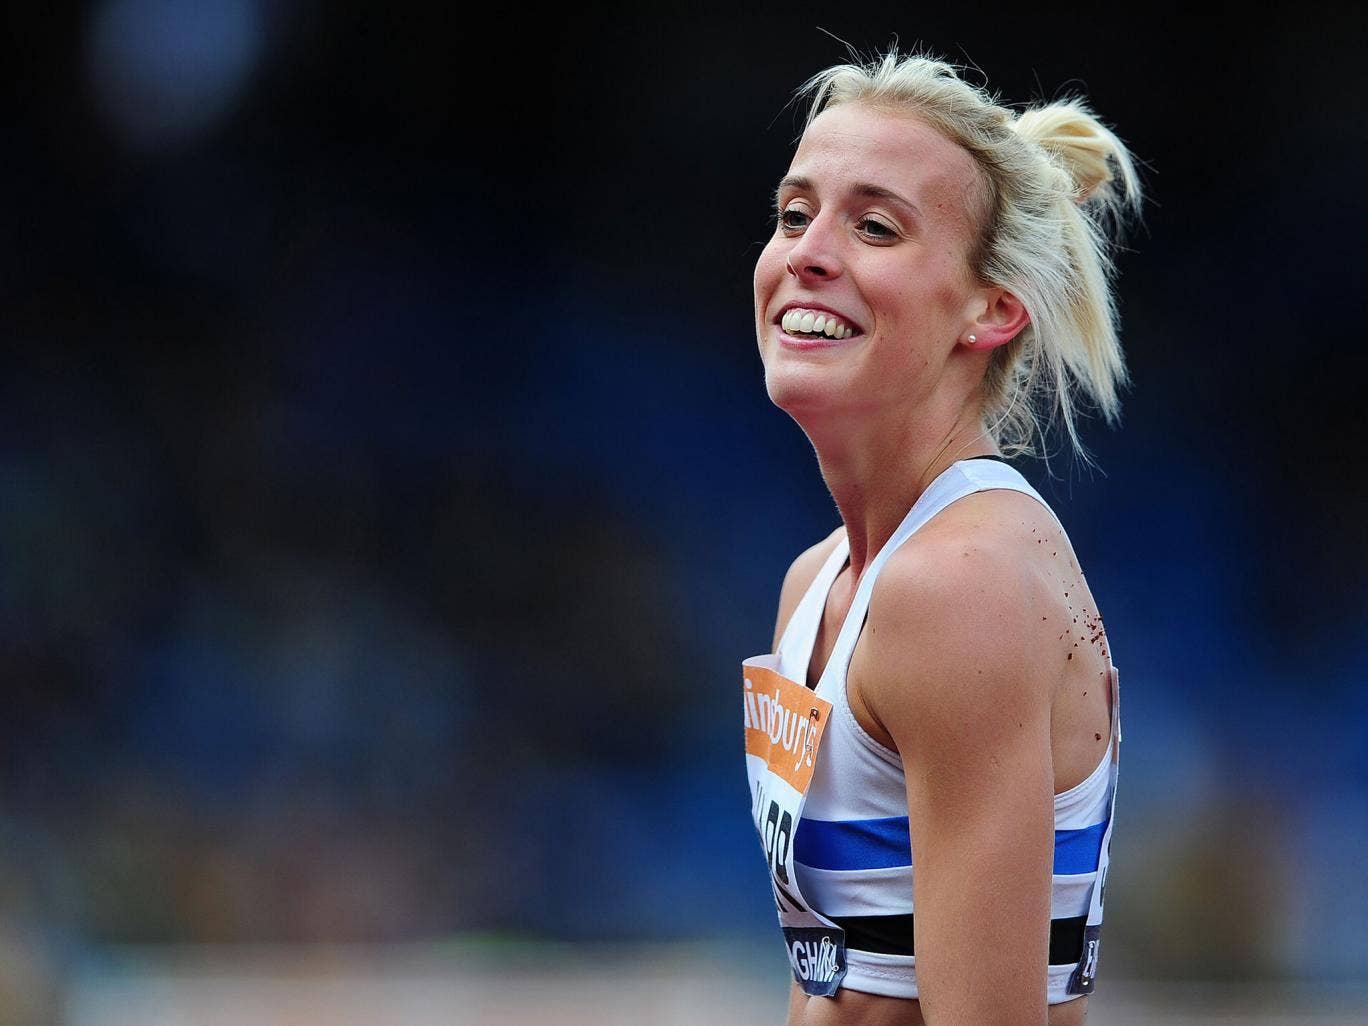 Lyndsey Sharp celebrates winning the women's 800m final